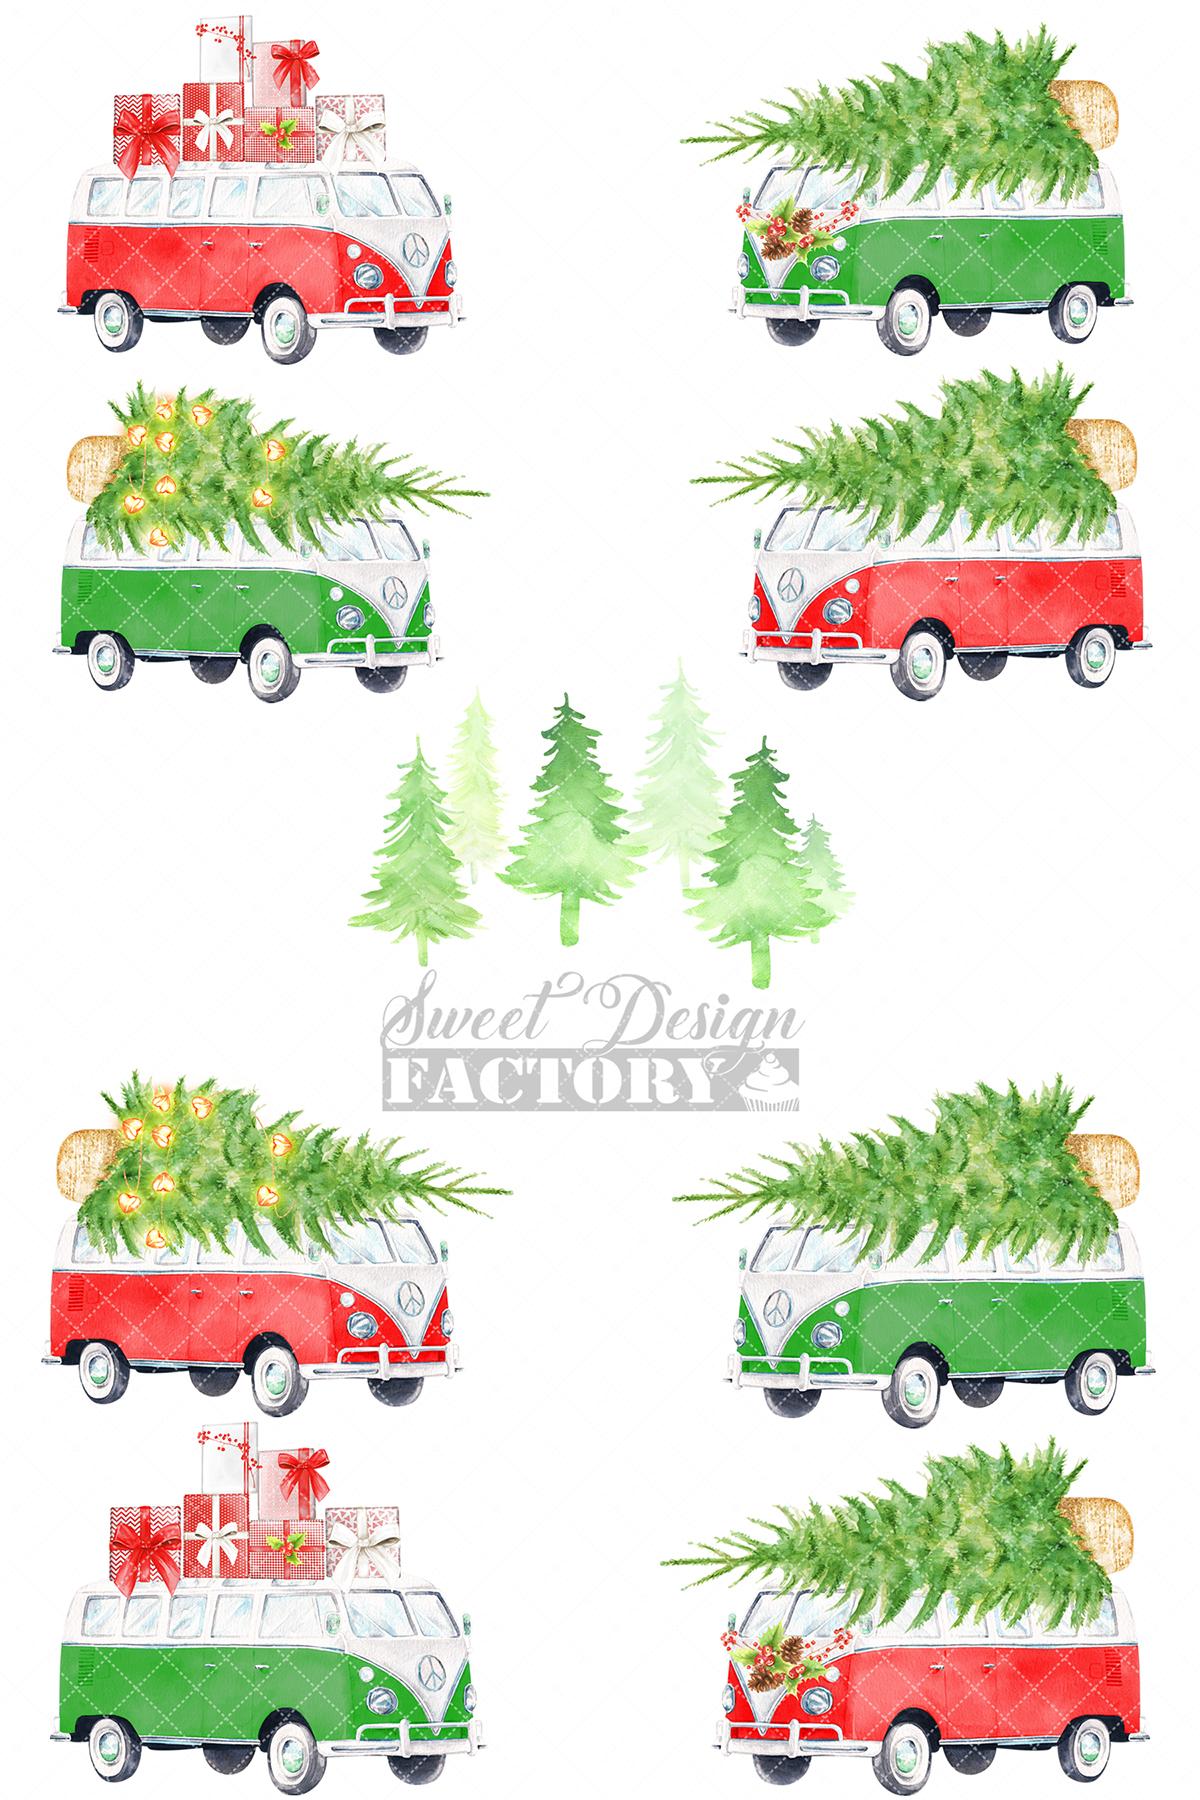 Watercolor Christmas retro van clipart example image 2